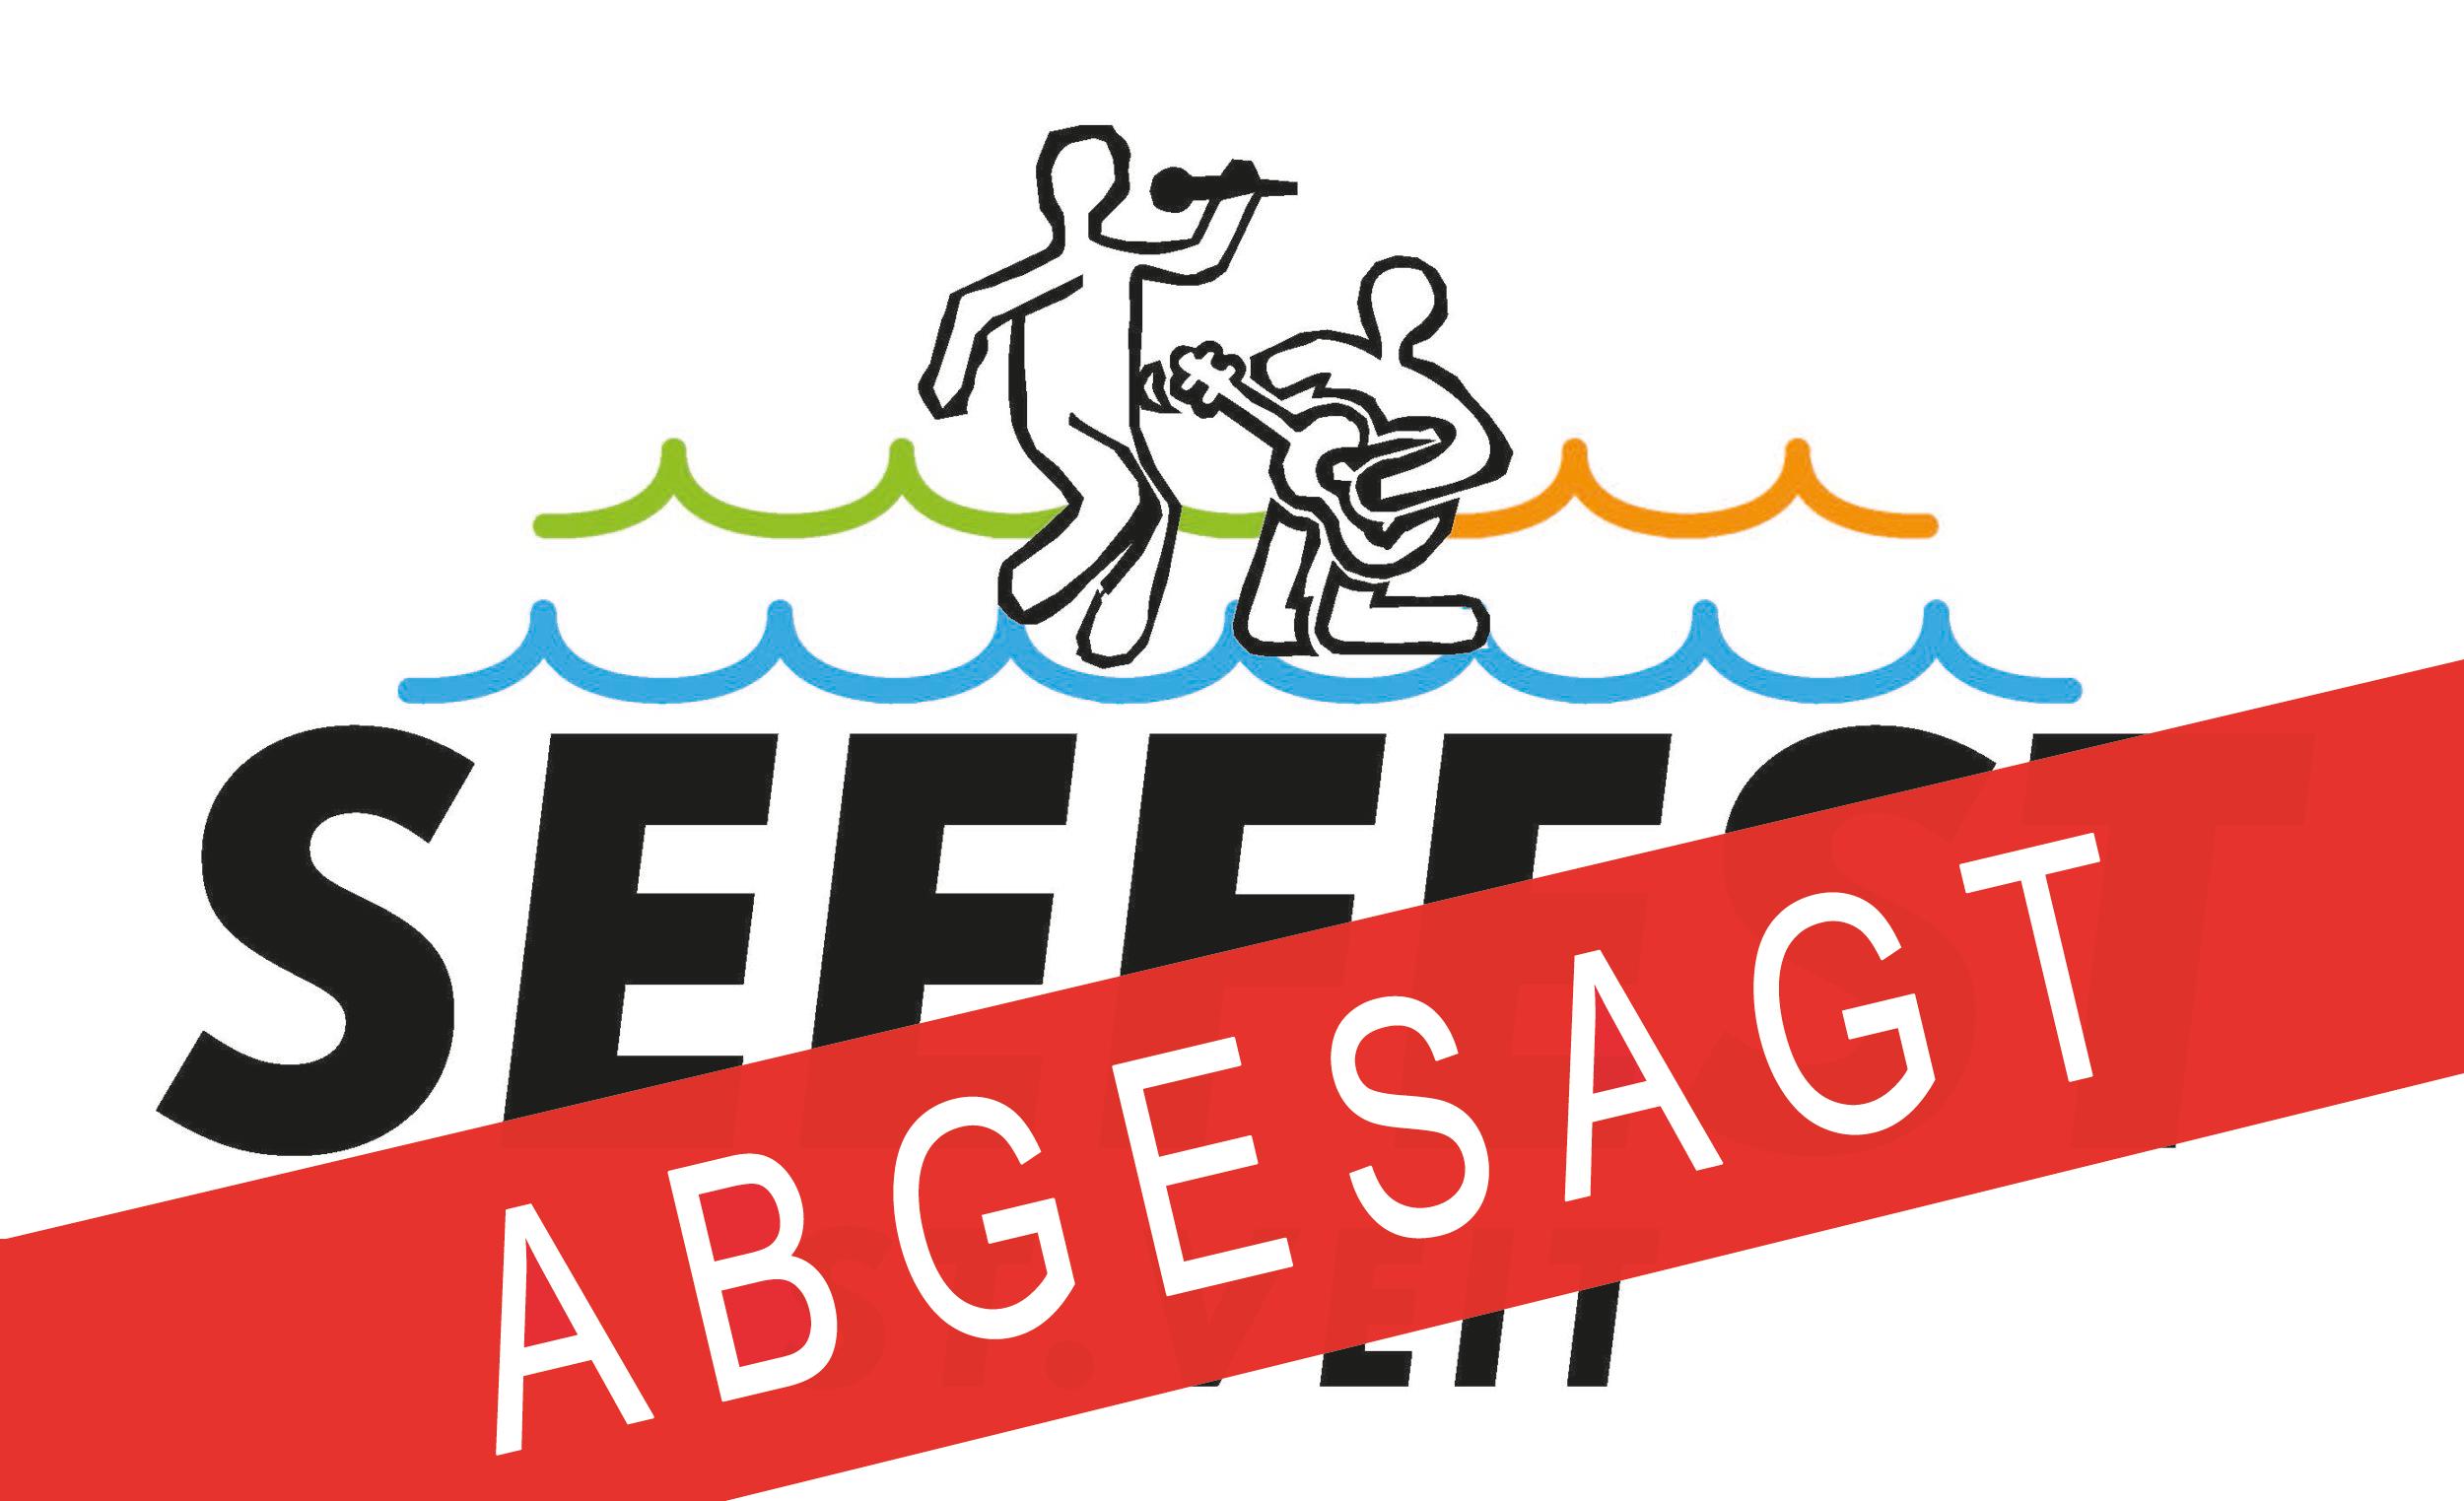 Logo - Seefest St. Veit